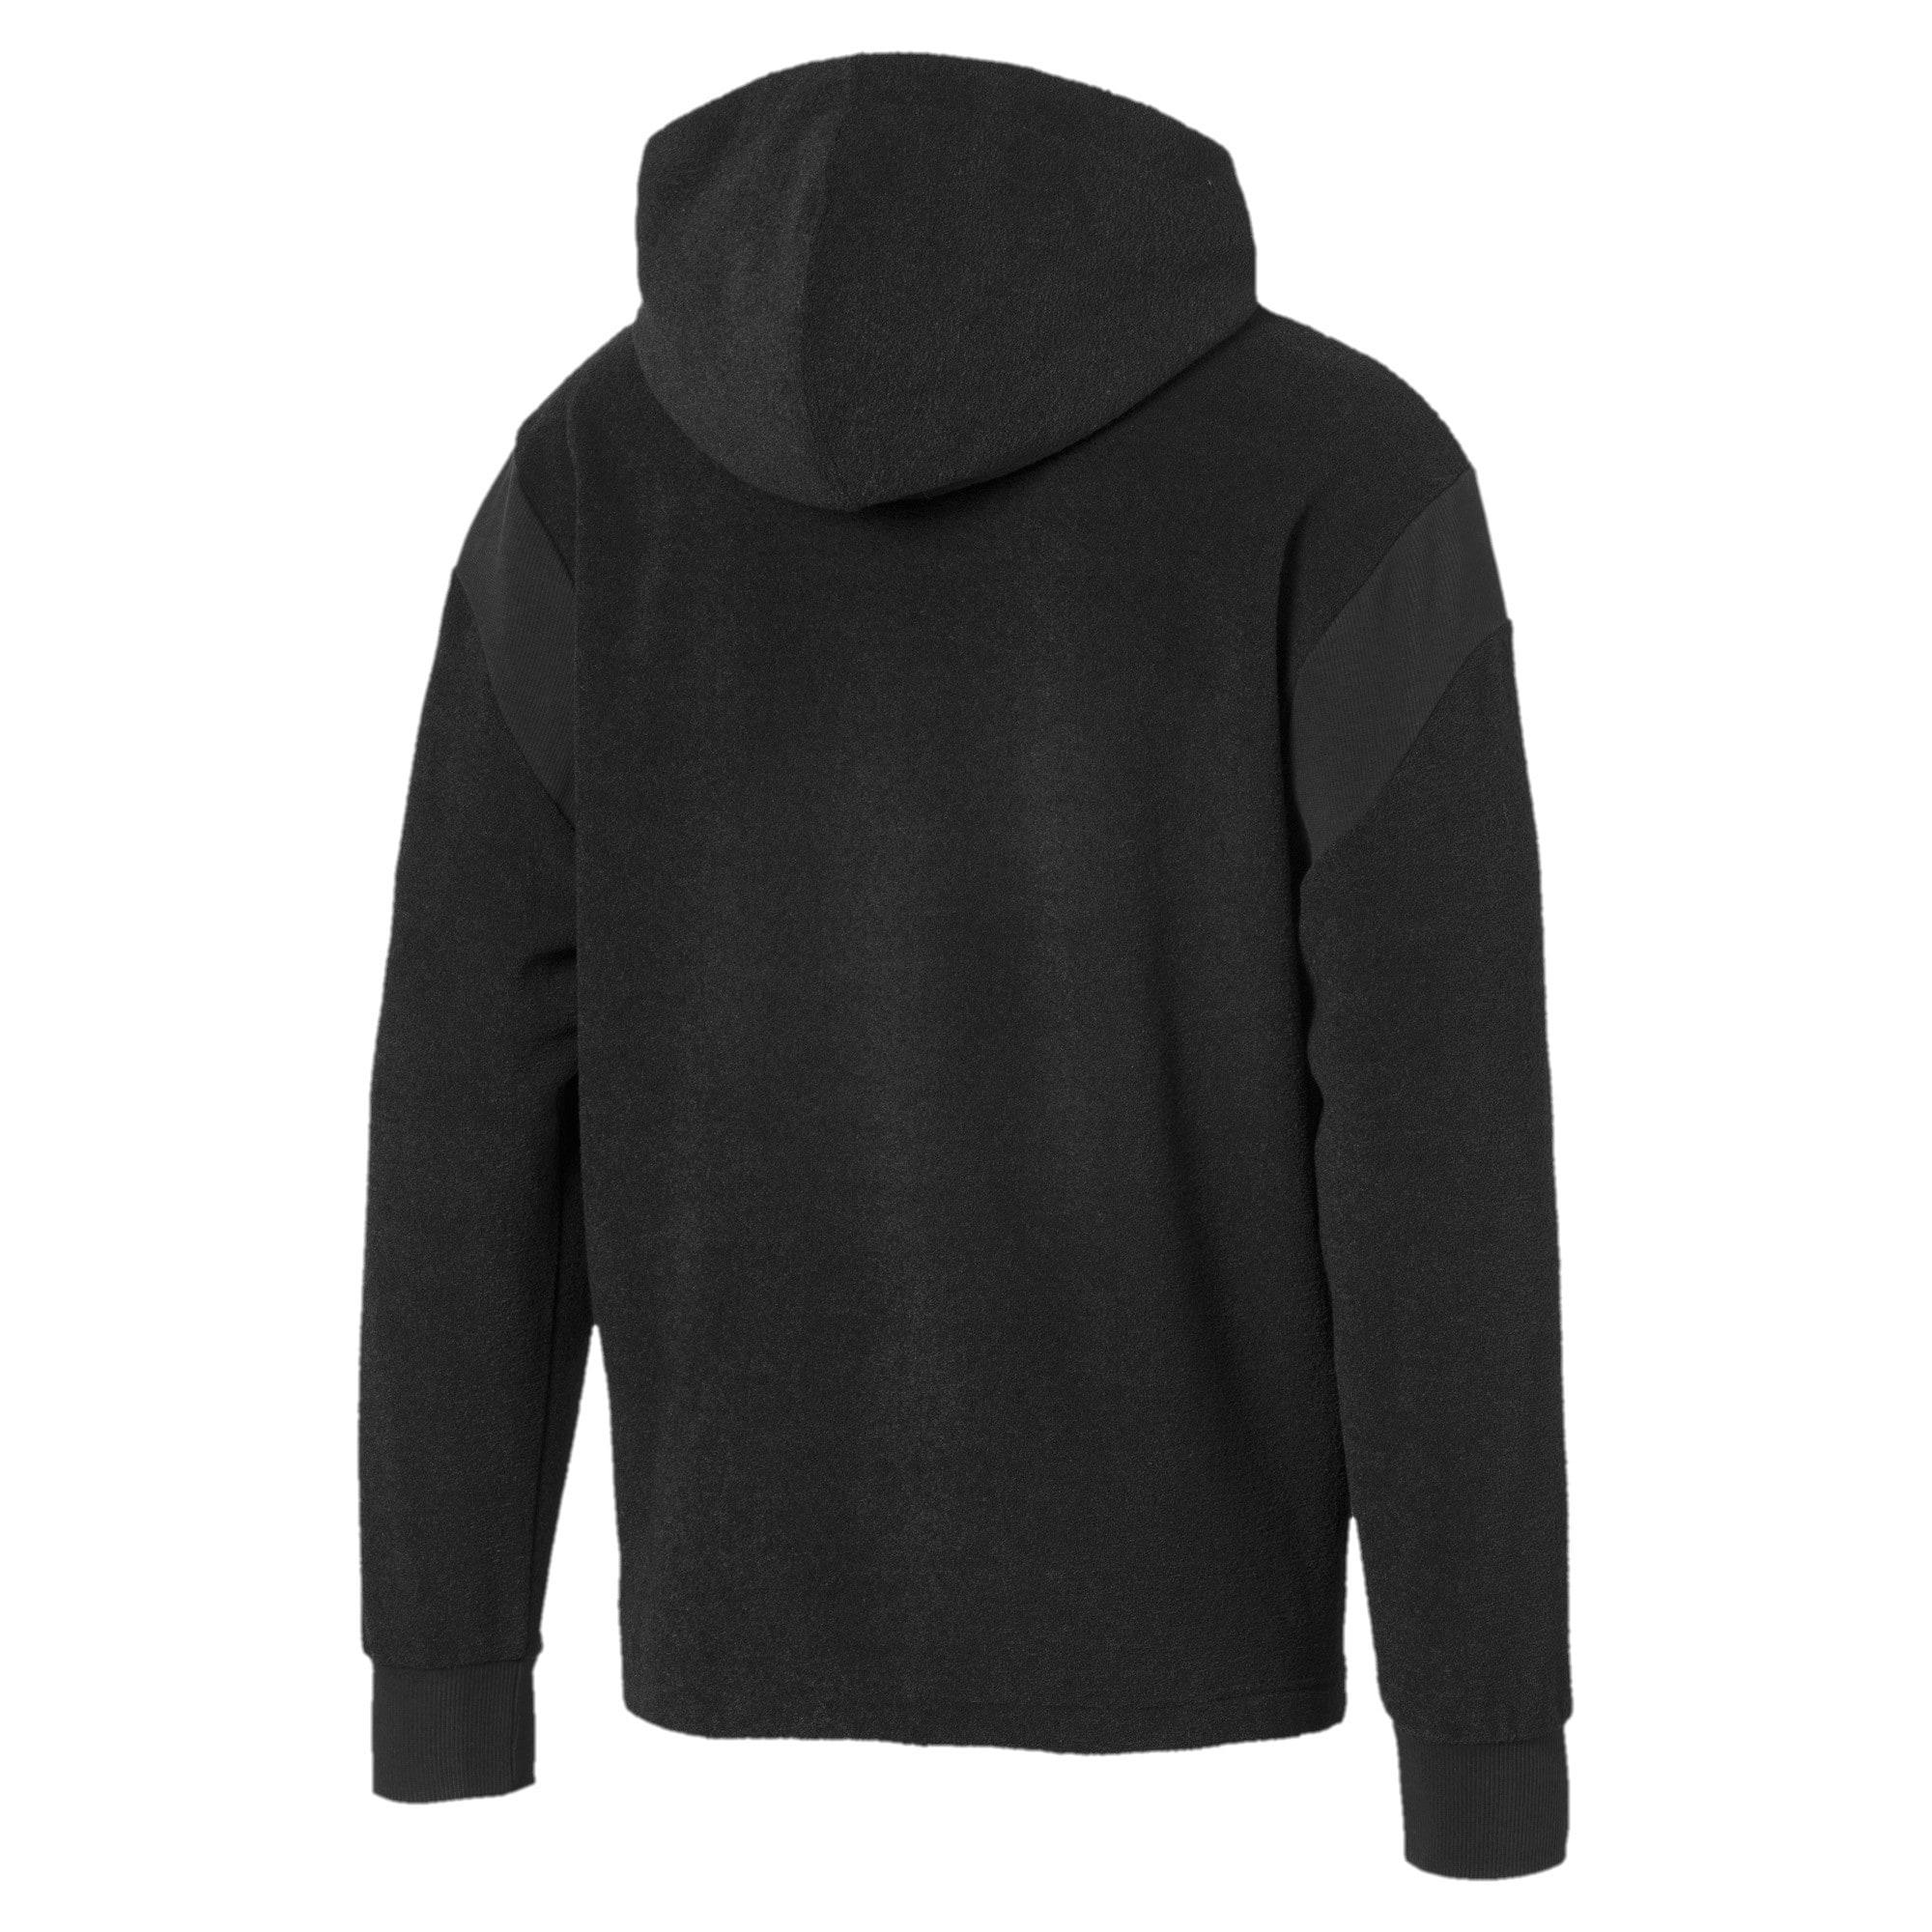 Thumbnail 5 of Fusion Fleece Hooded Men's Sweat Jacket, Puma Black, medium-IND